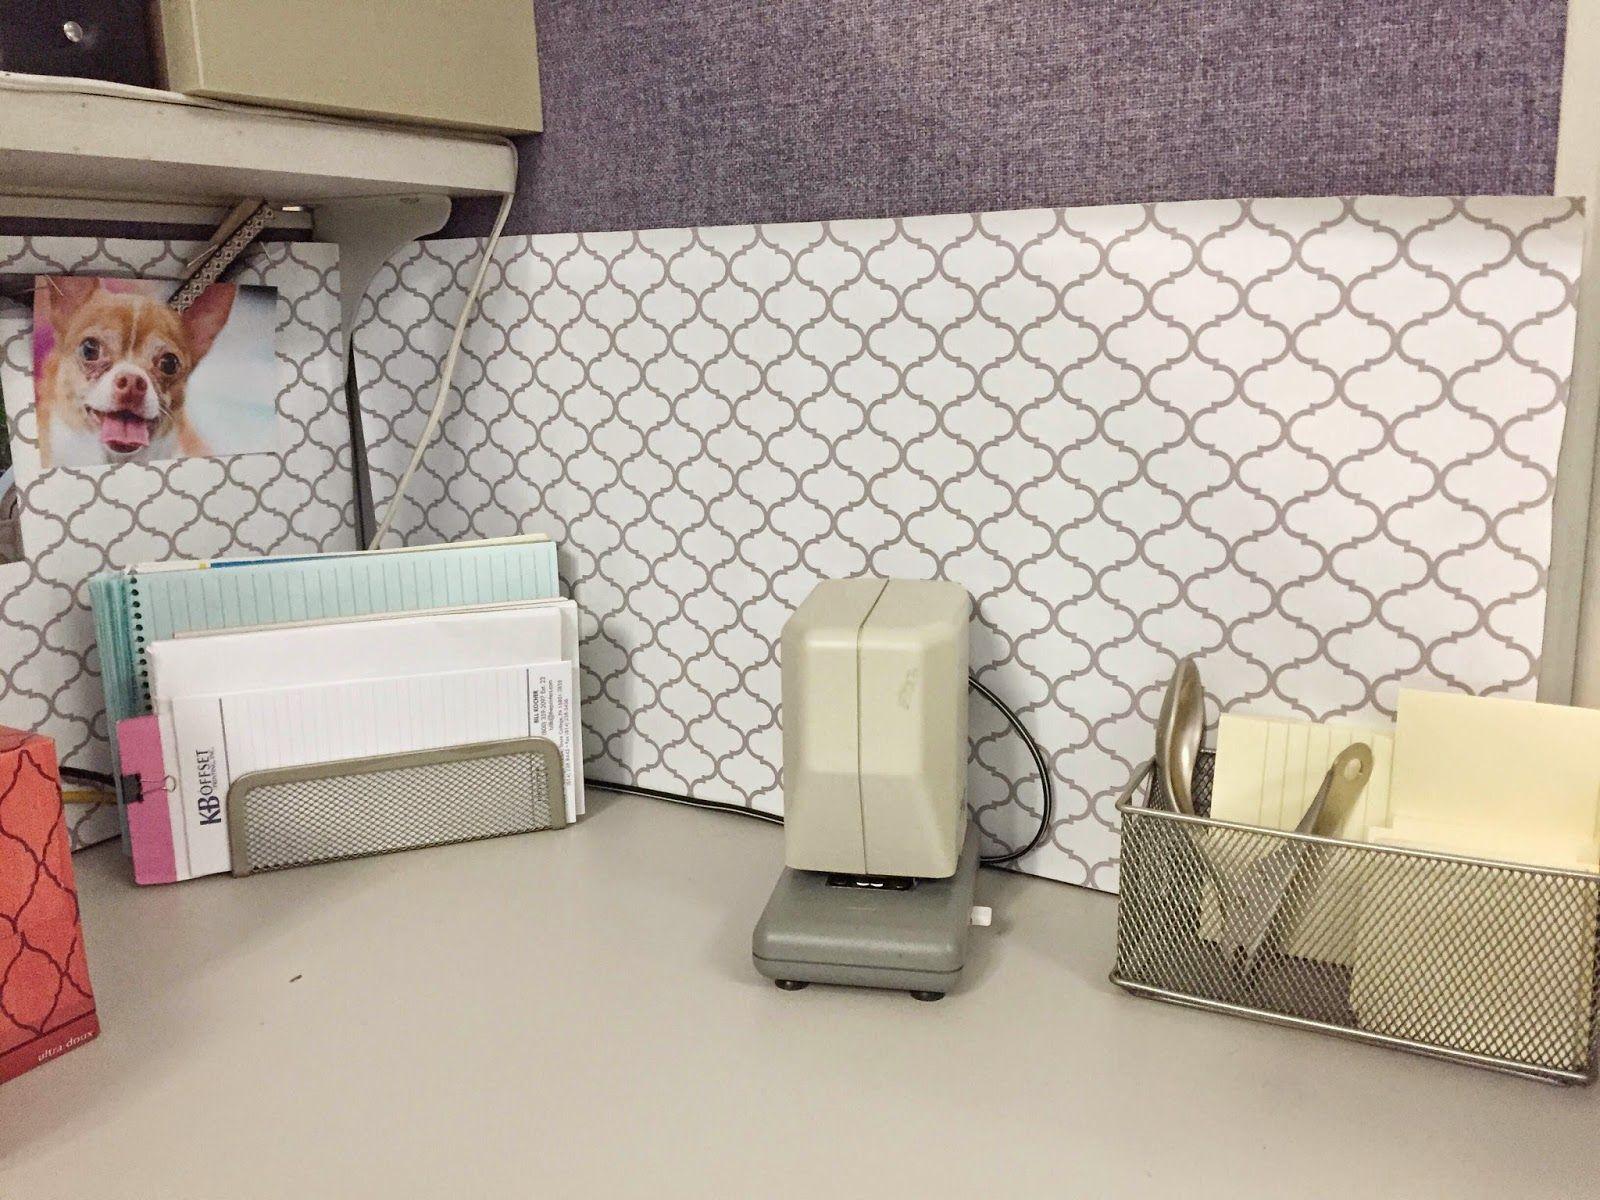 Financing Home accessories, Finance, Appliances